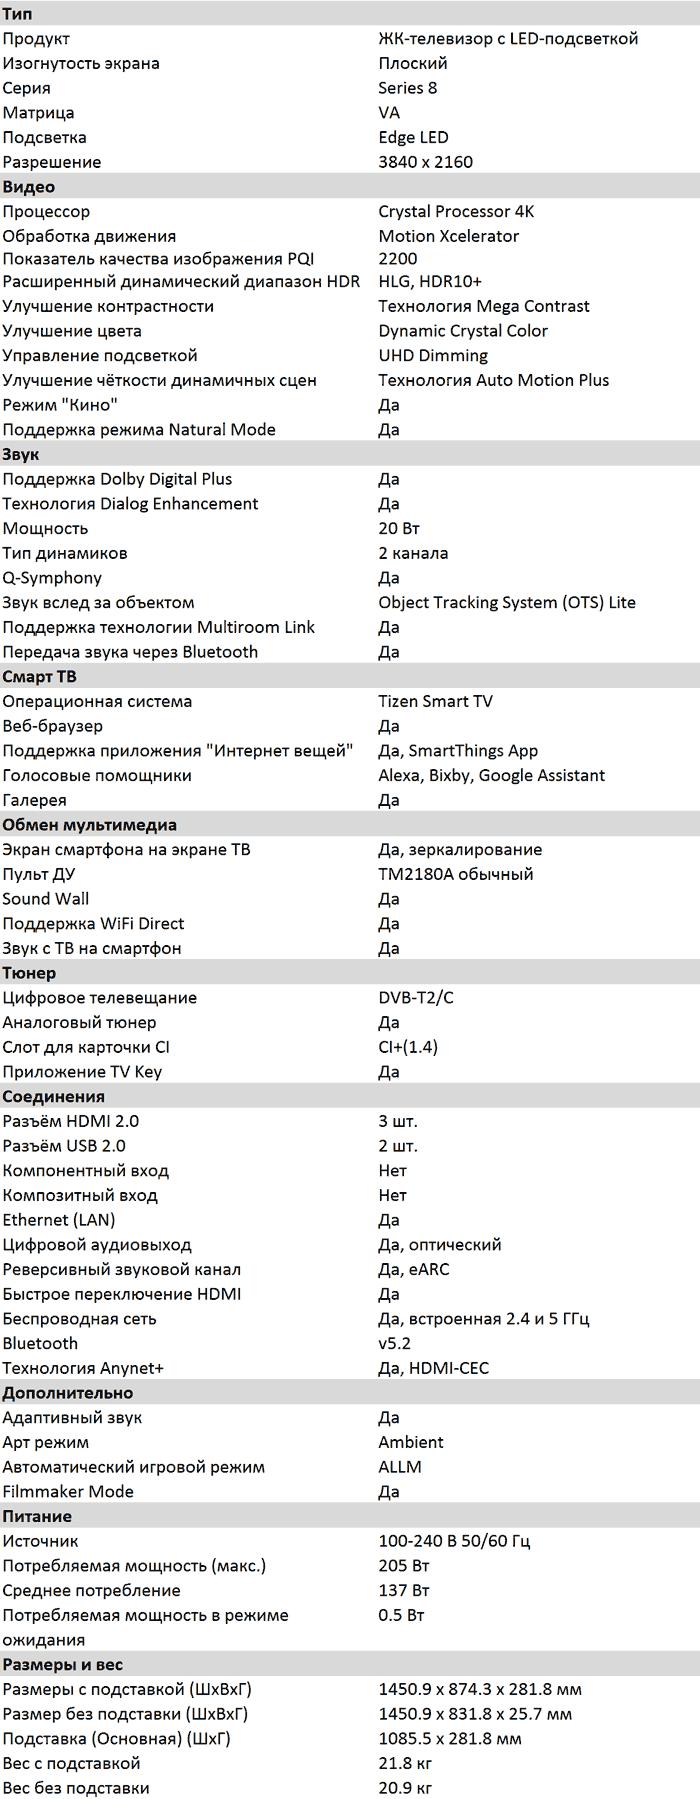 Характеристики AU8000